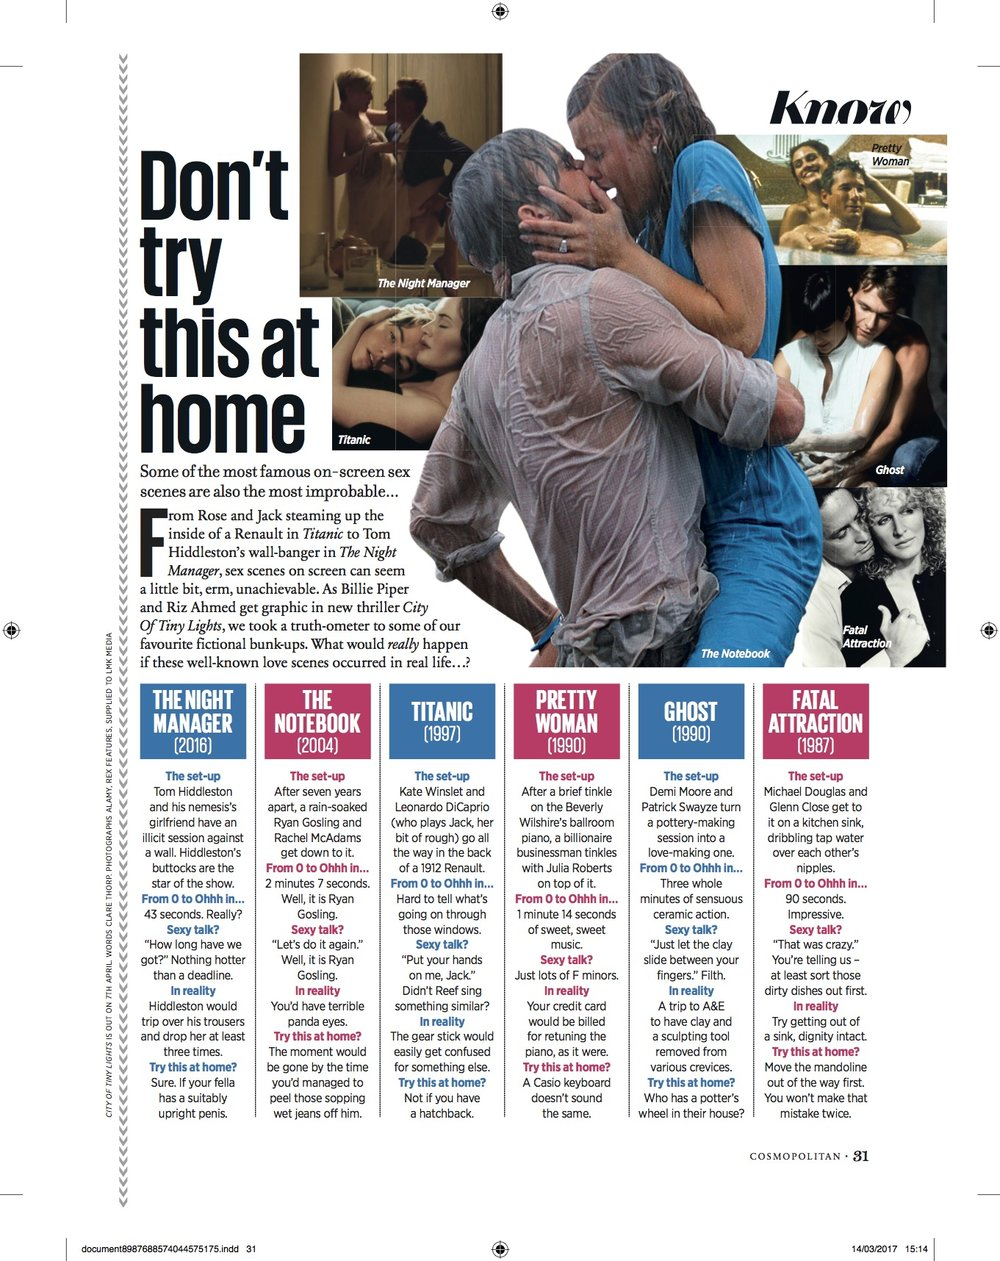 Cosmopolitan Sex Scenes.jpg